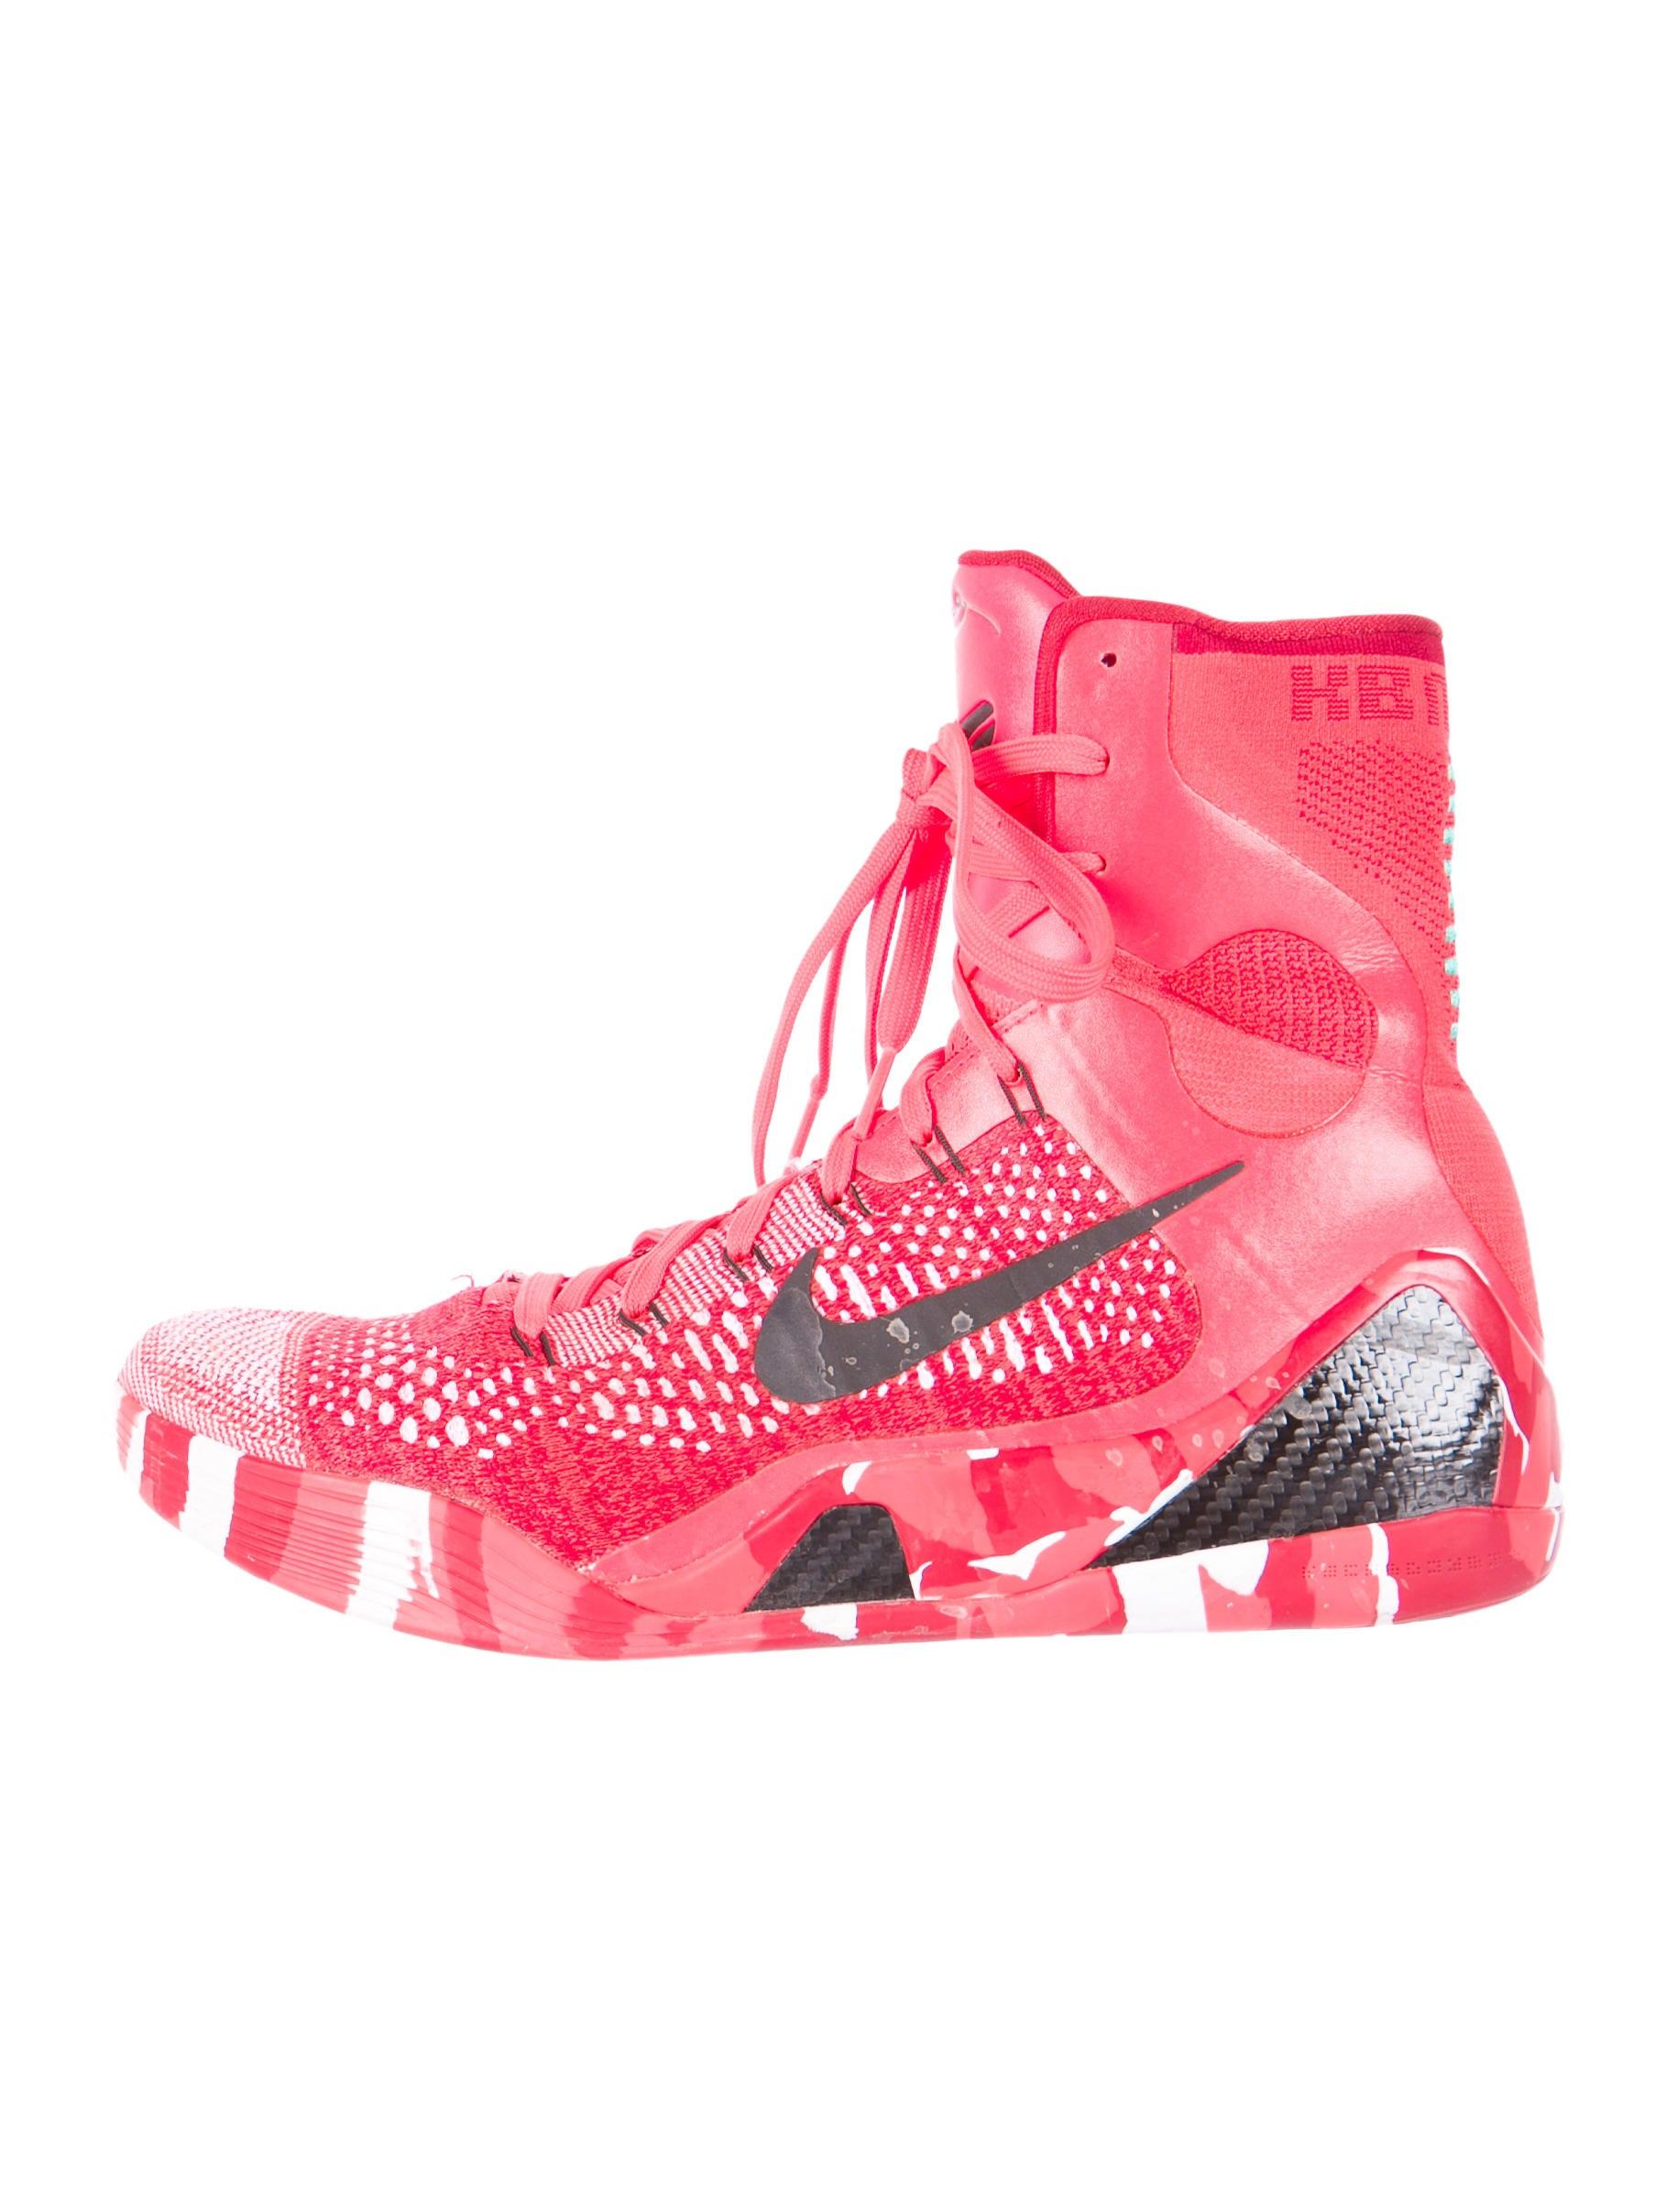 hot sales f210c dfbf3 ... closeout kobe 9 elite sneakers kobe 9 elite sneakers . 16c45 1342c